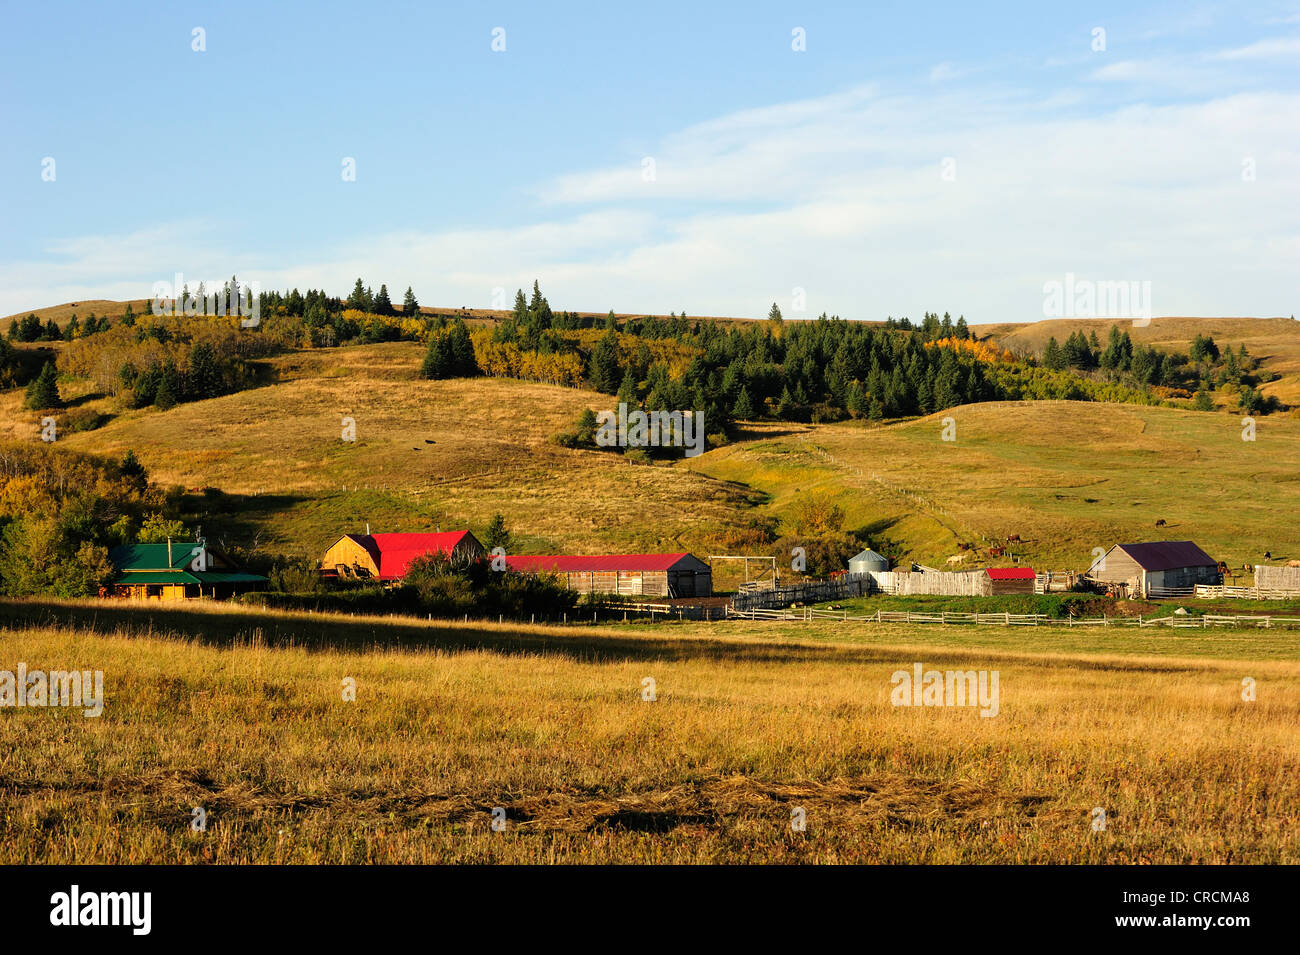 Ranch de cow-boy dans la prairie, Saskatchewan, Canada Photo Stock